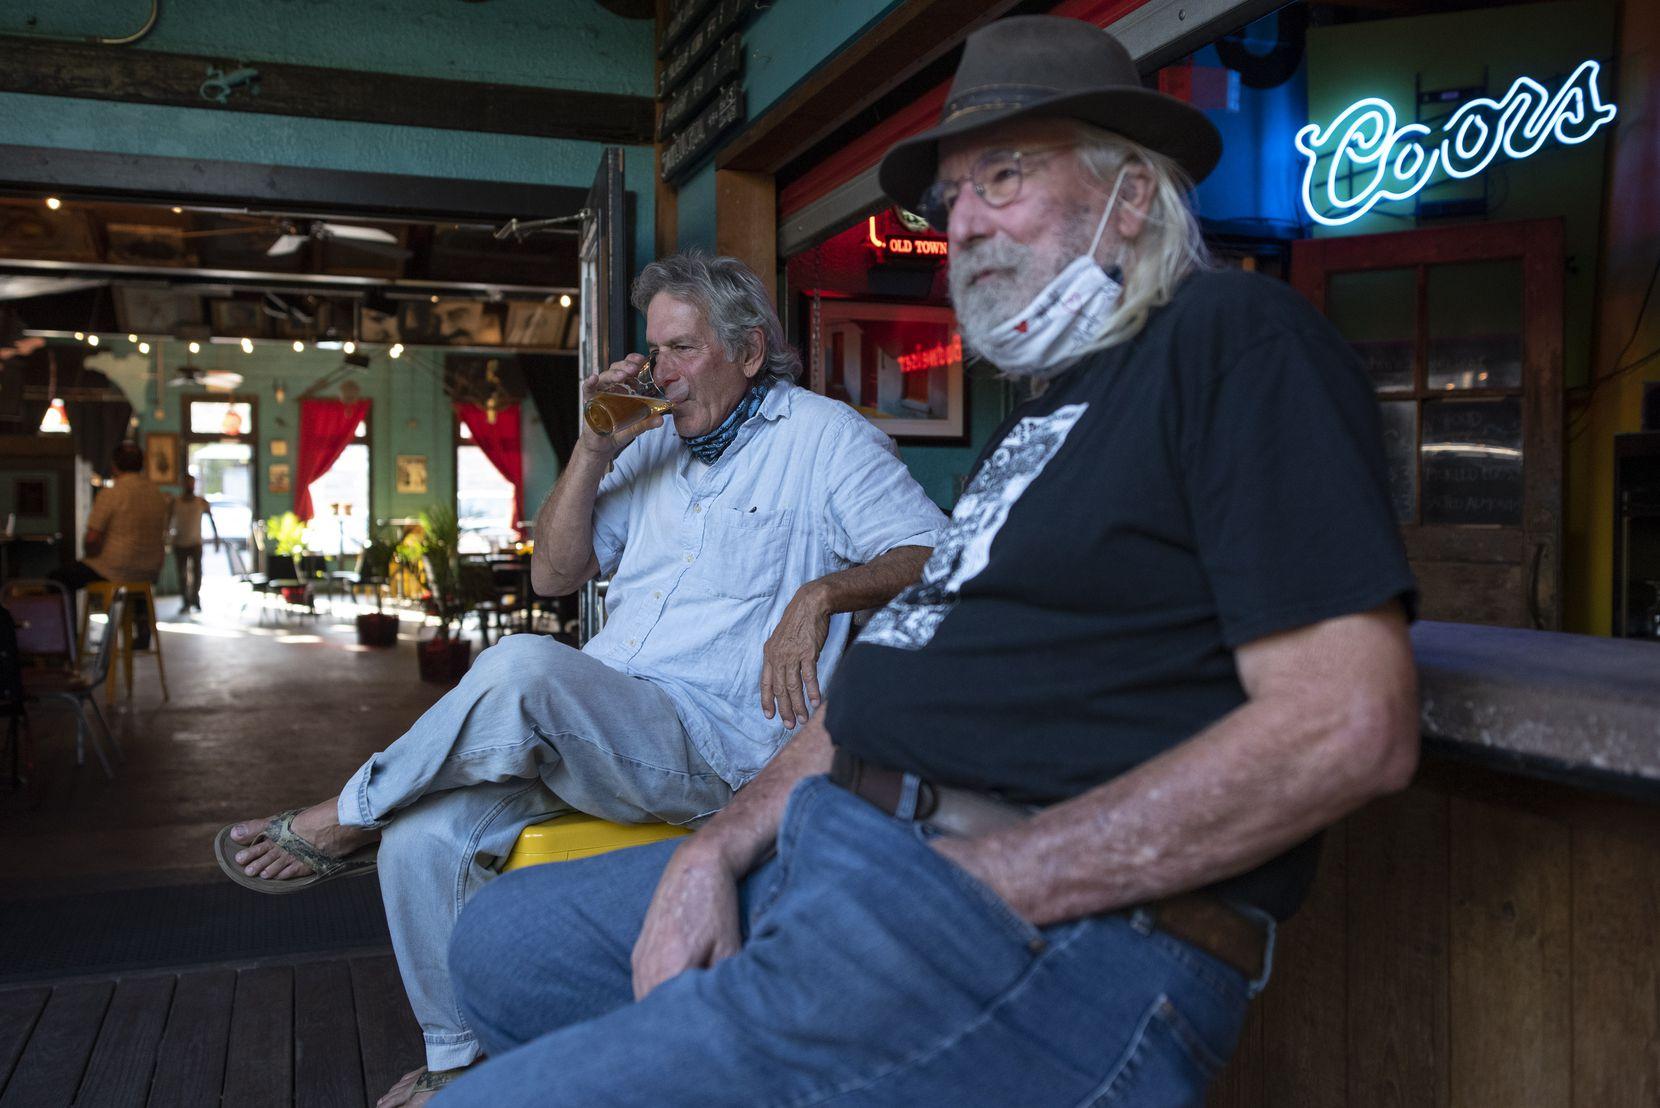 Dan's Silverleaf co-owner Dan Mojica (left) had a beer with John Snow on the bar's patio.